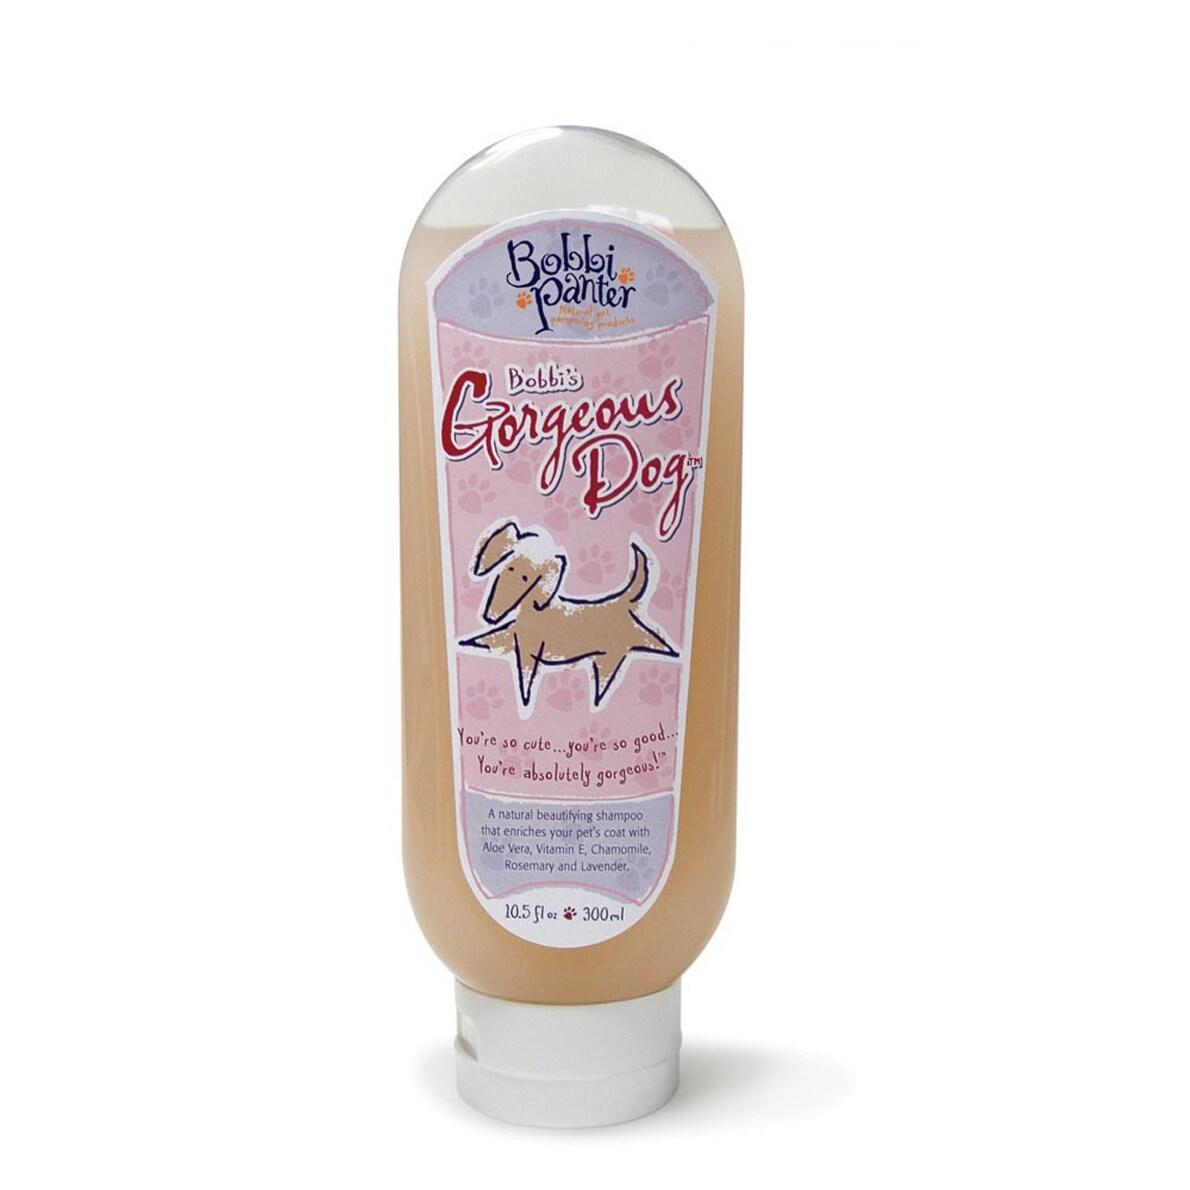 Bobbi Panter Gorgeous Dog 10-ounce Shampoo with Peach Fragrance